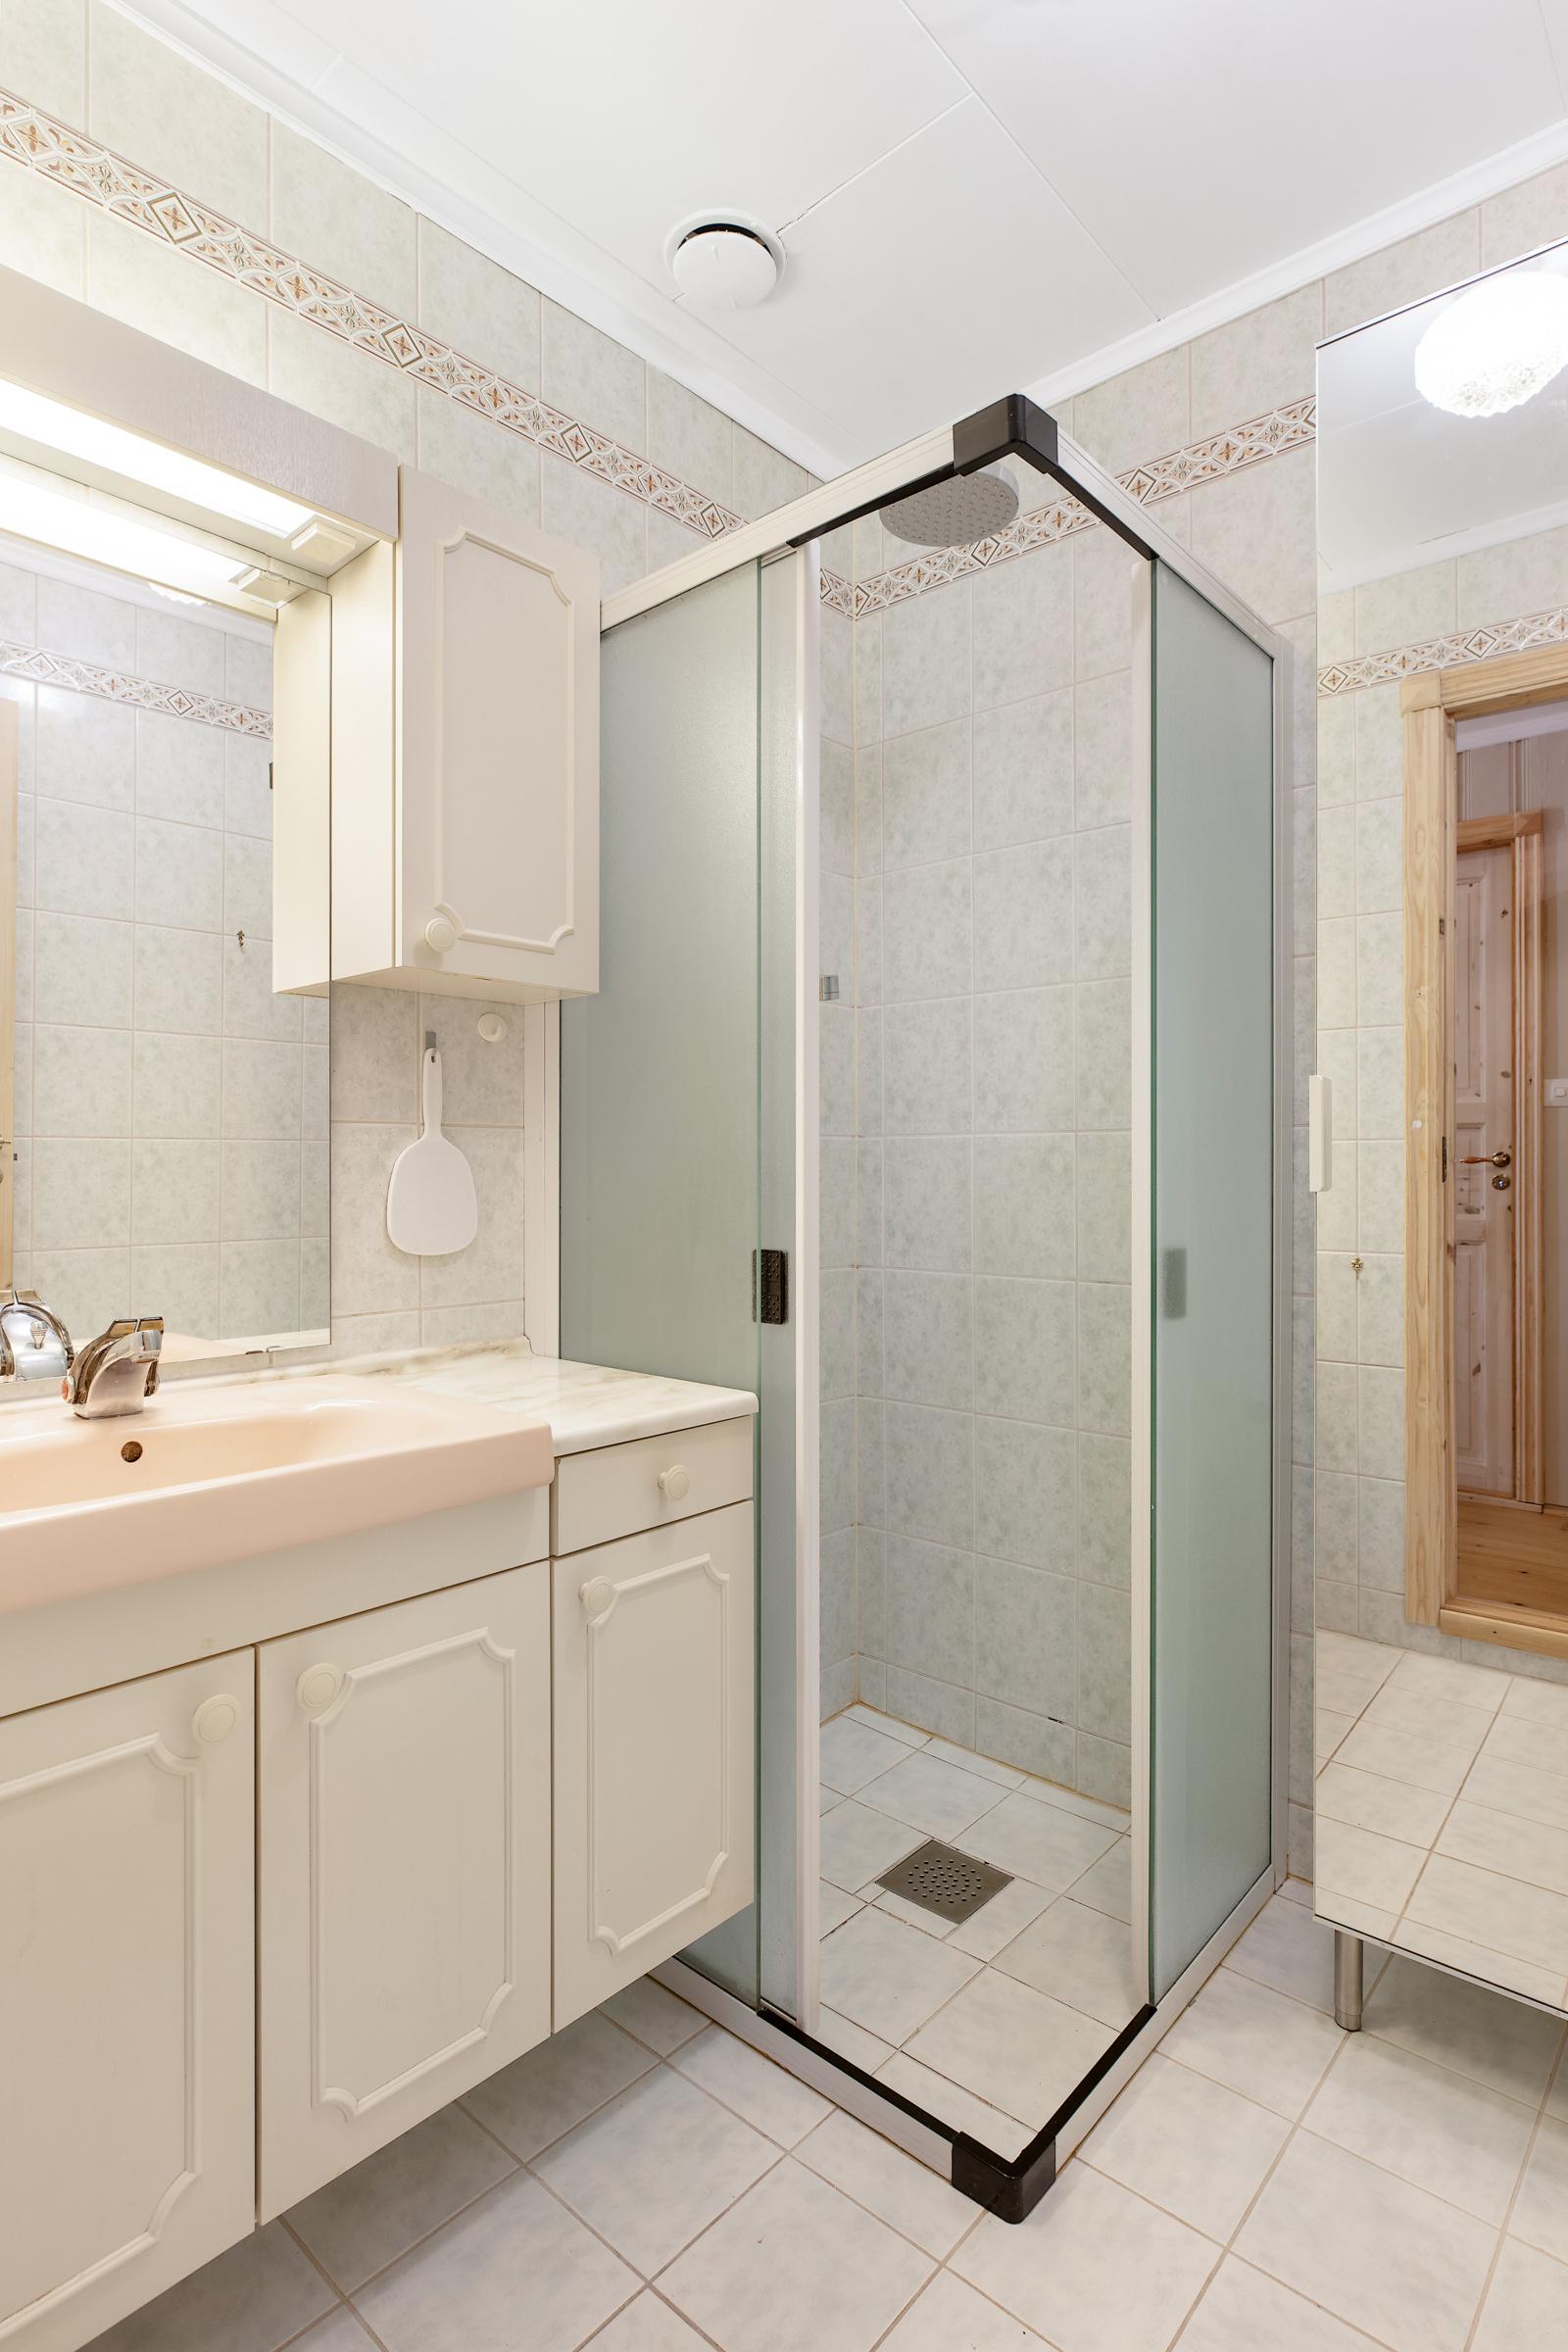 Det er 2 bad i boligen - Dette er badet i hovedetasjen